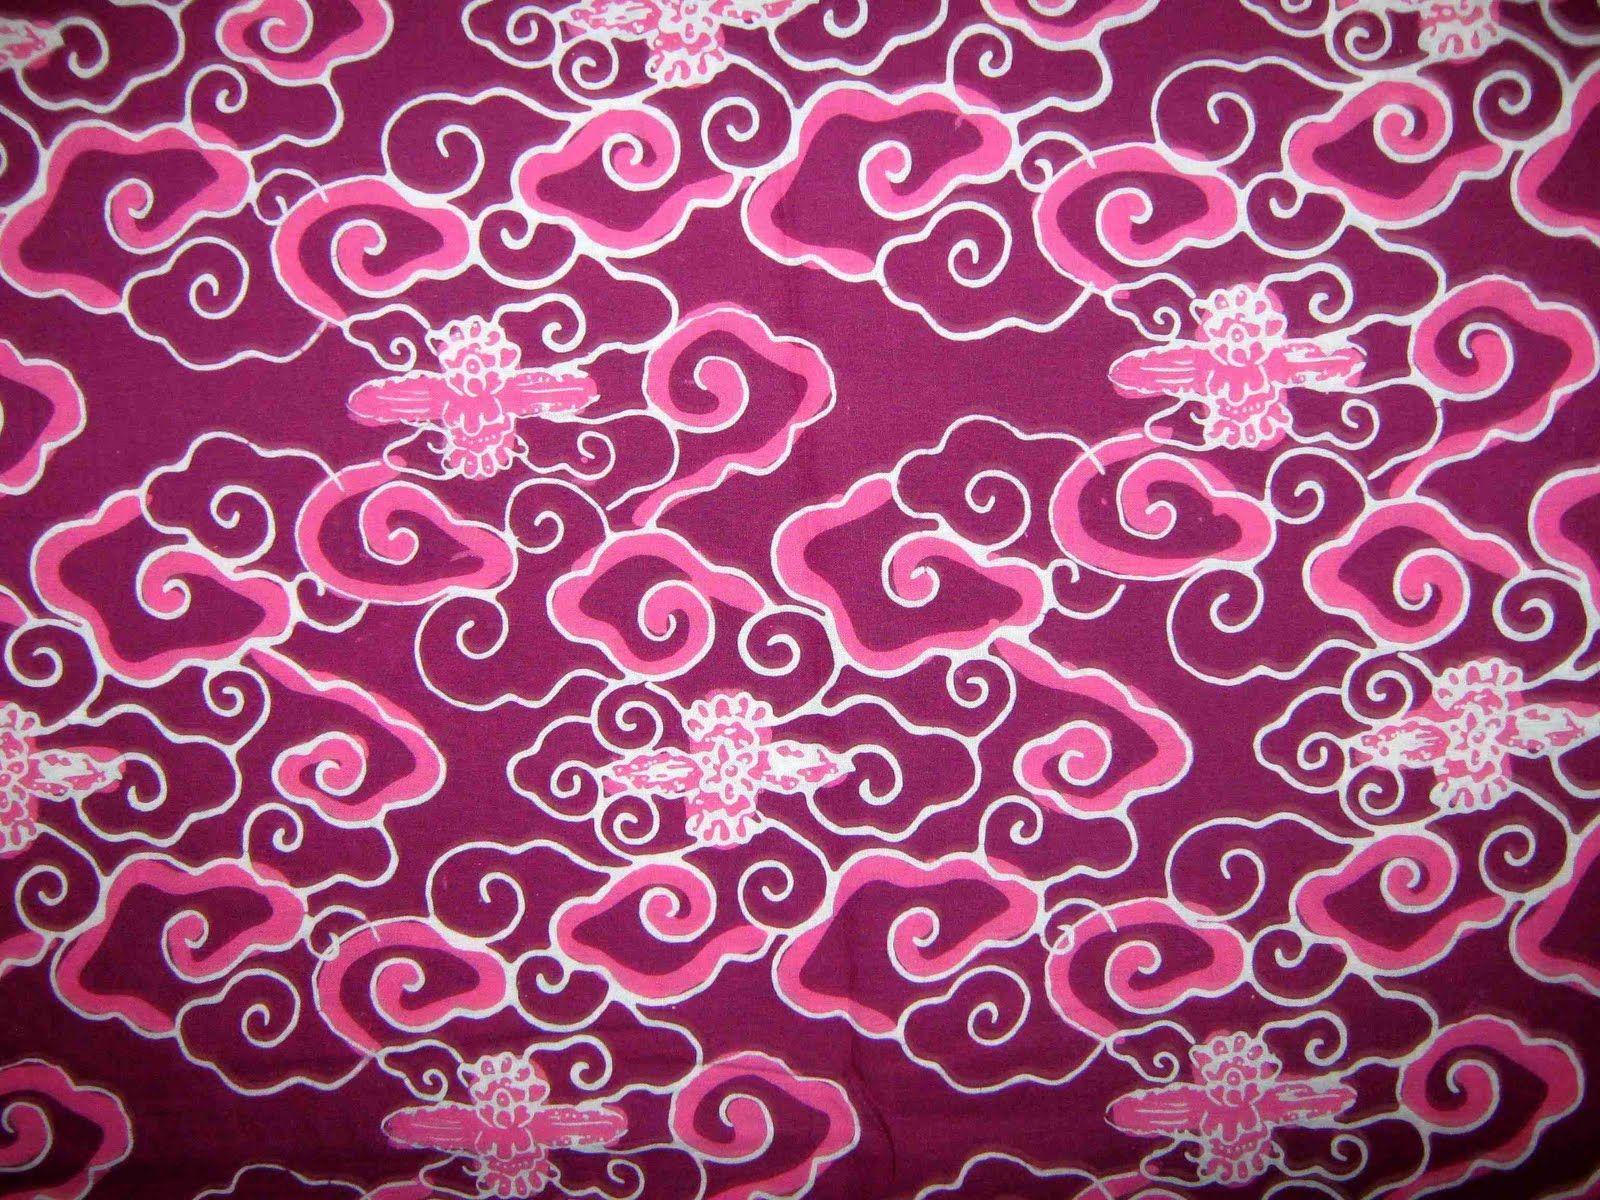 7000 Gambar Batik Hd  Terbaru